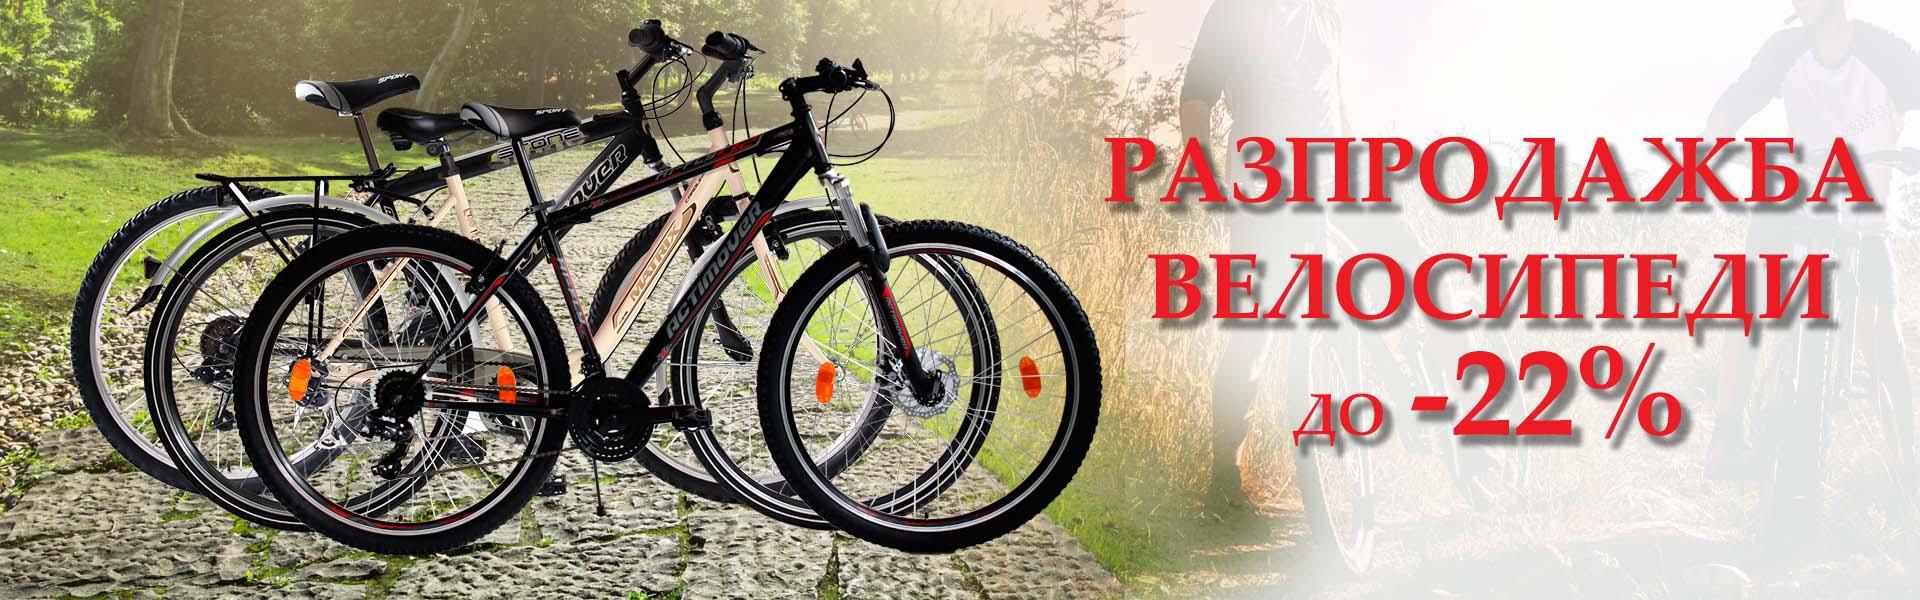 Разпродажба на велосипеди